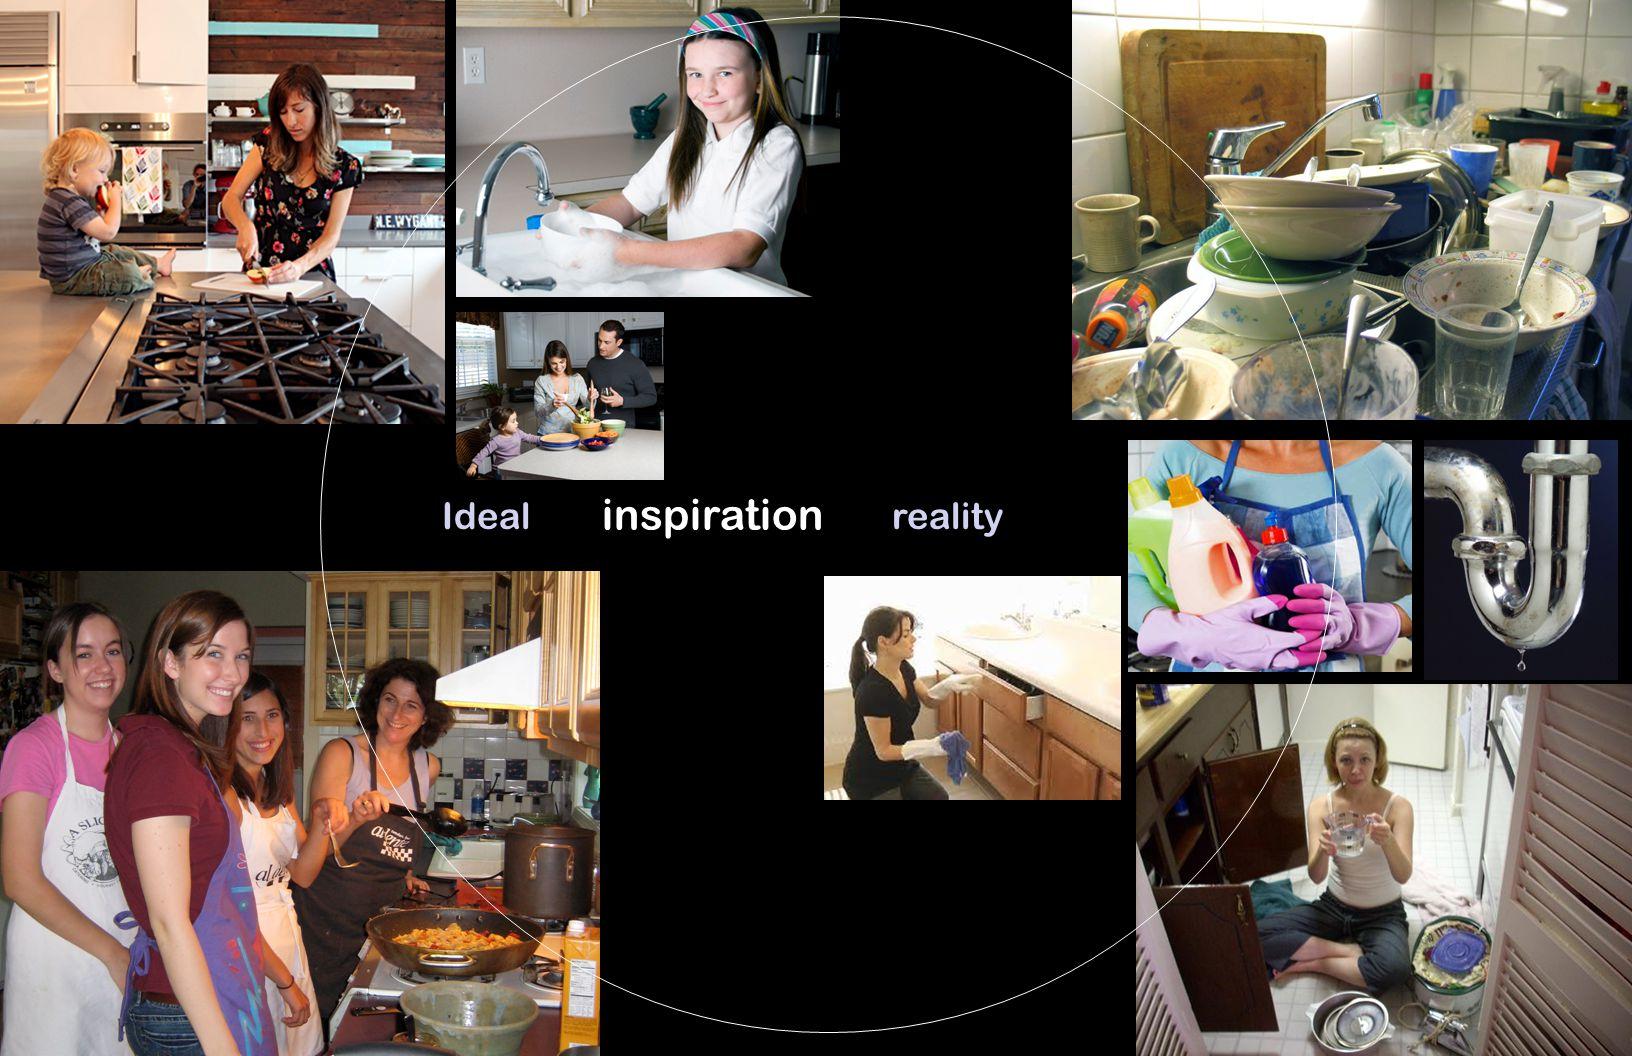 Idealreality inspiration